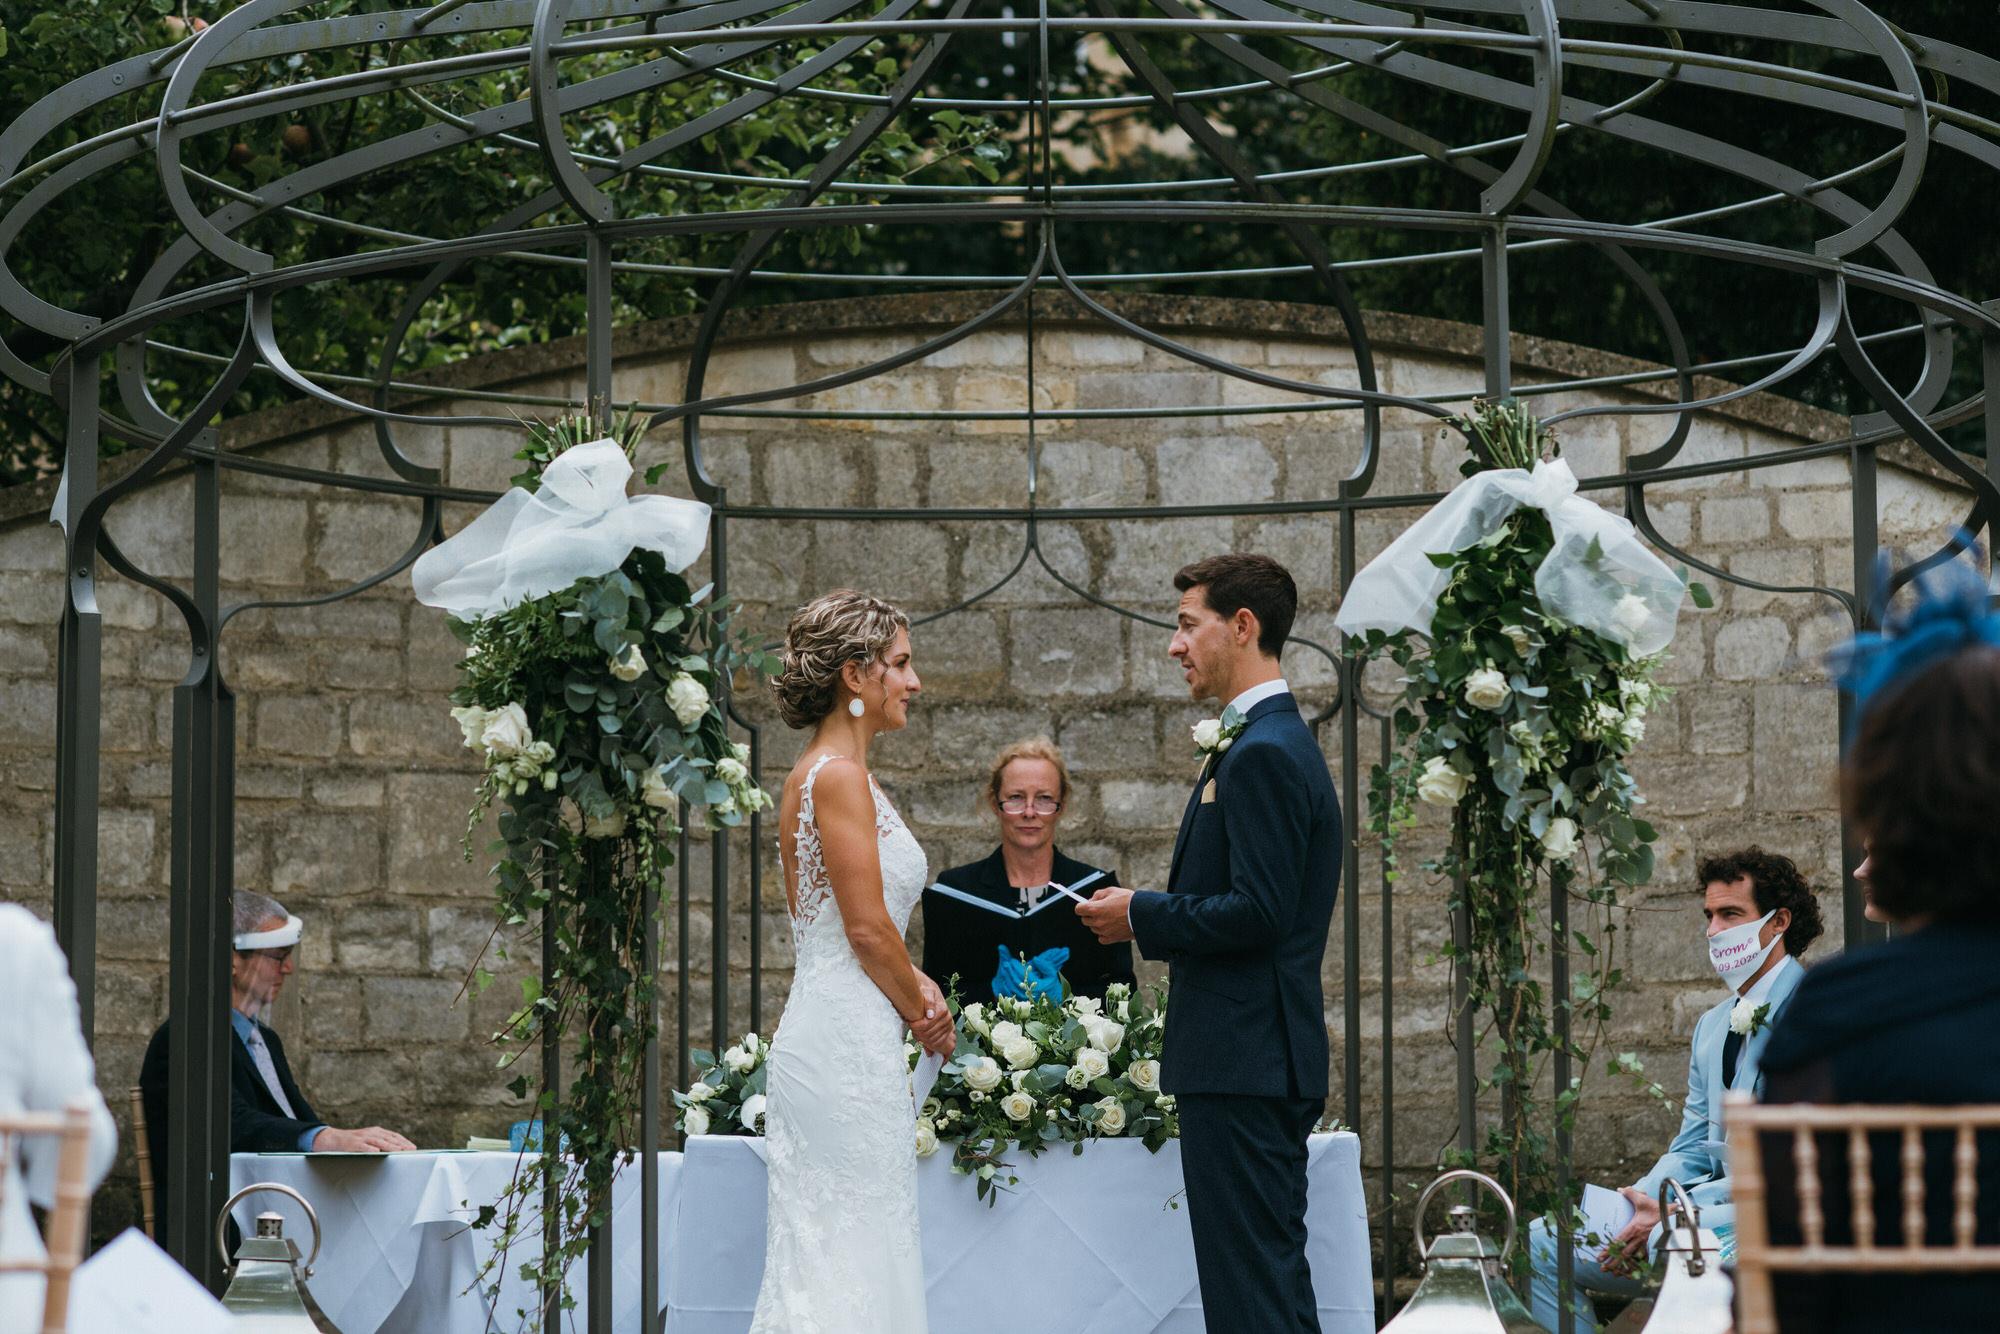 Royal crescent hotel wedding outdoor